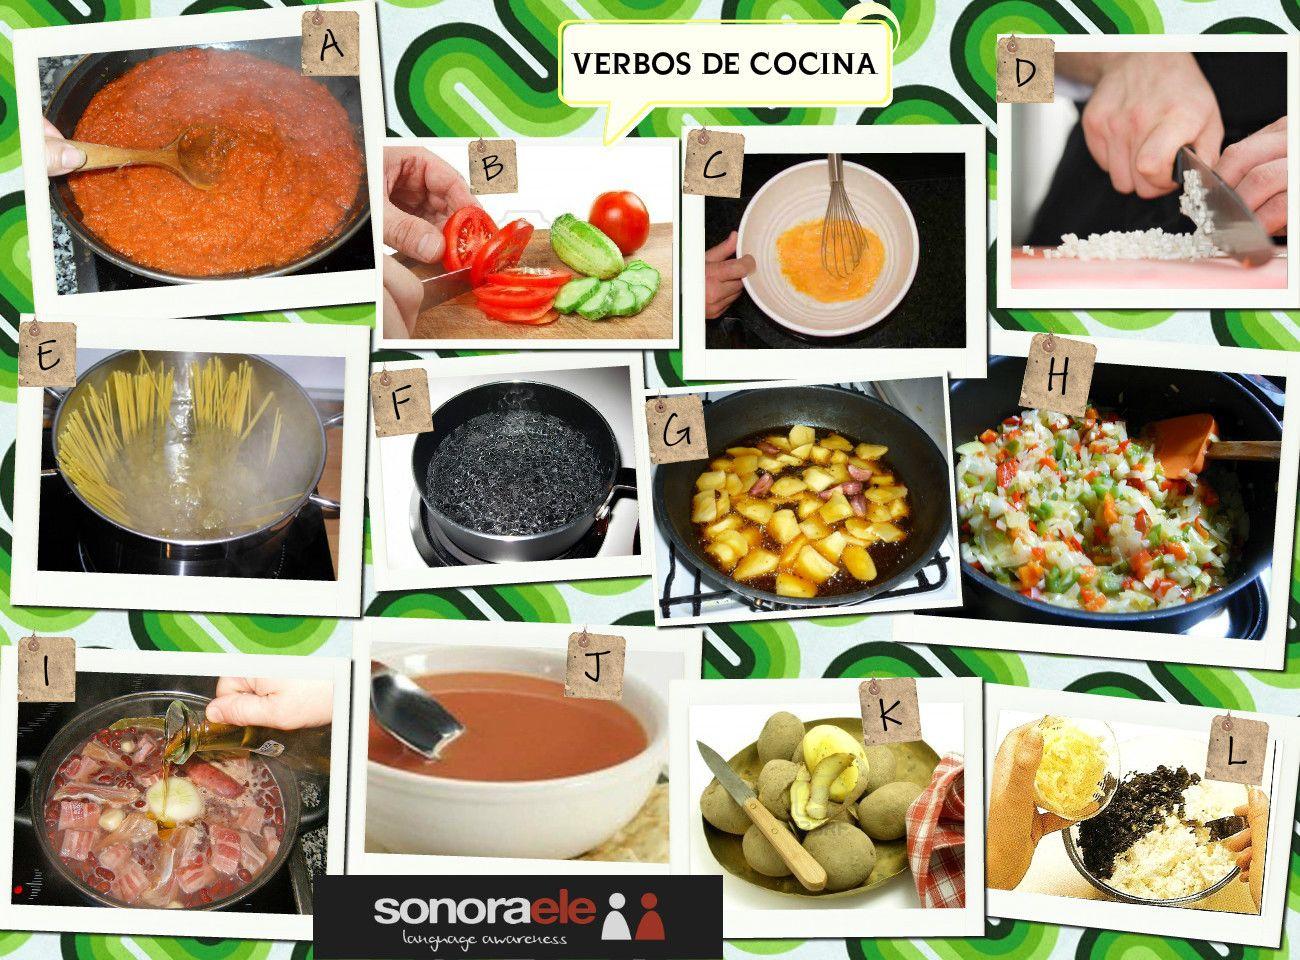 A2 b1 verbos de cocina descubre a qu imagen pertenecen for Cocinar para 9